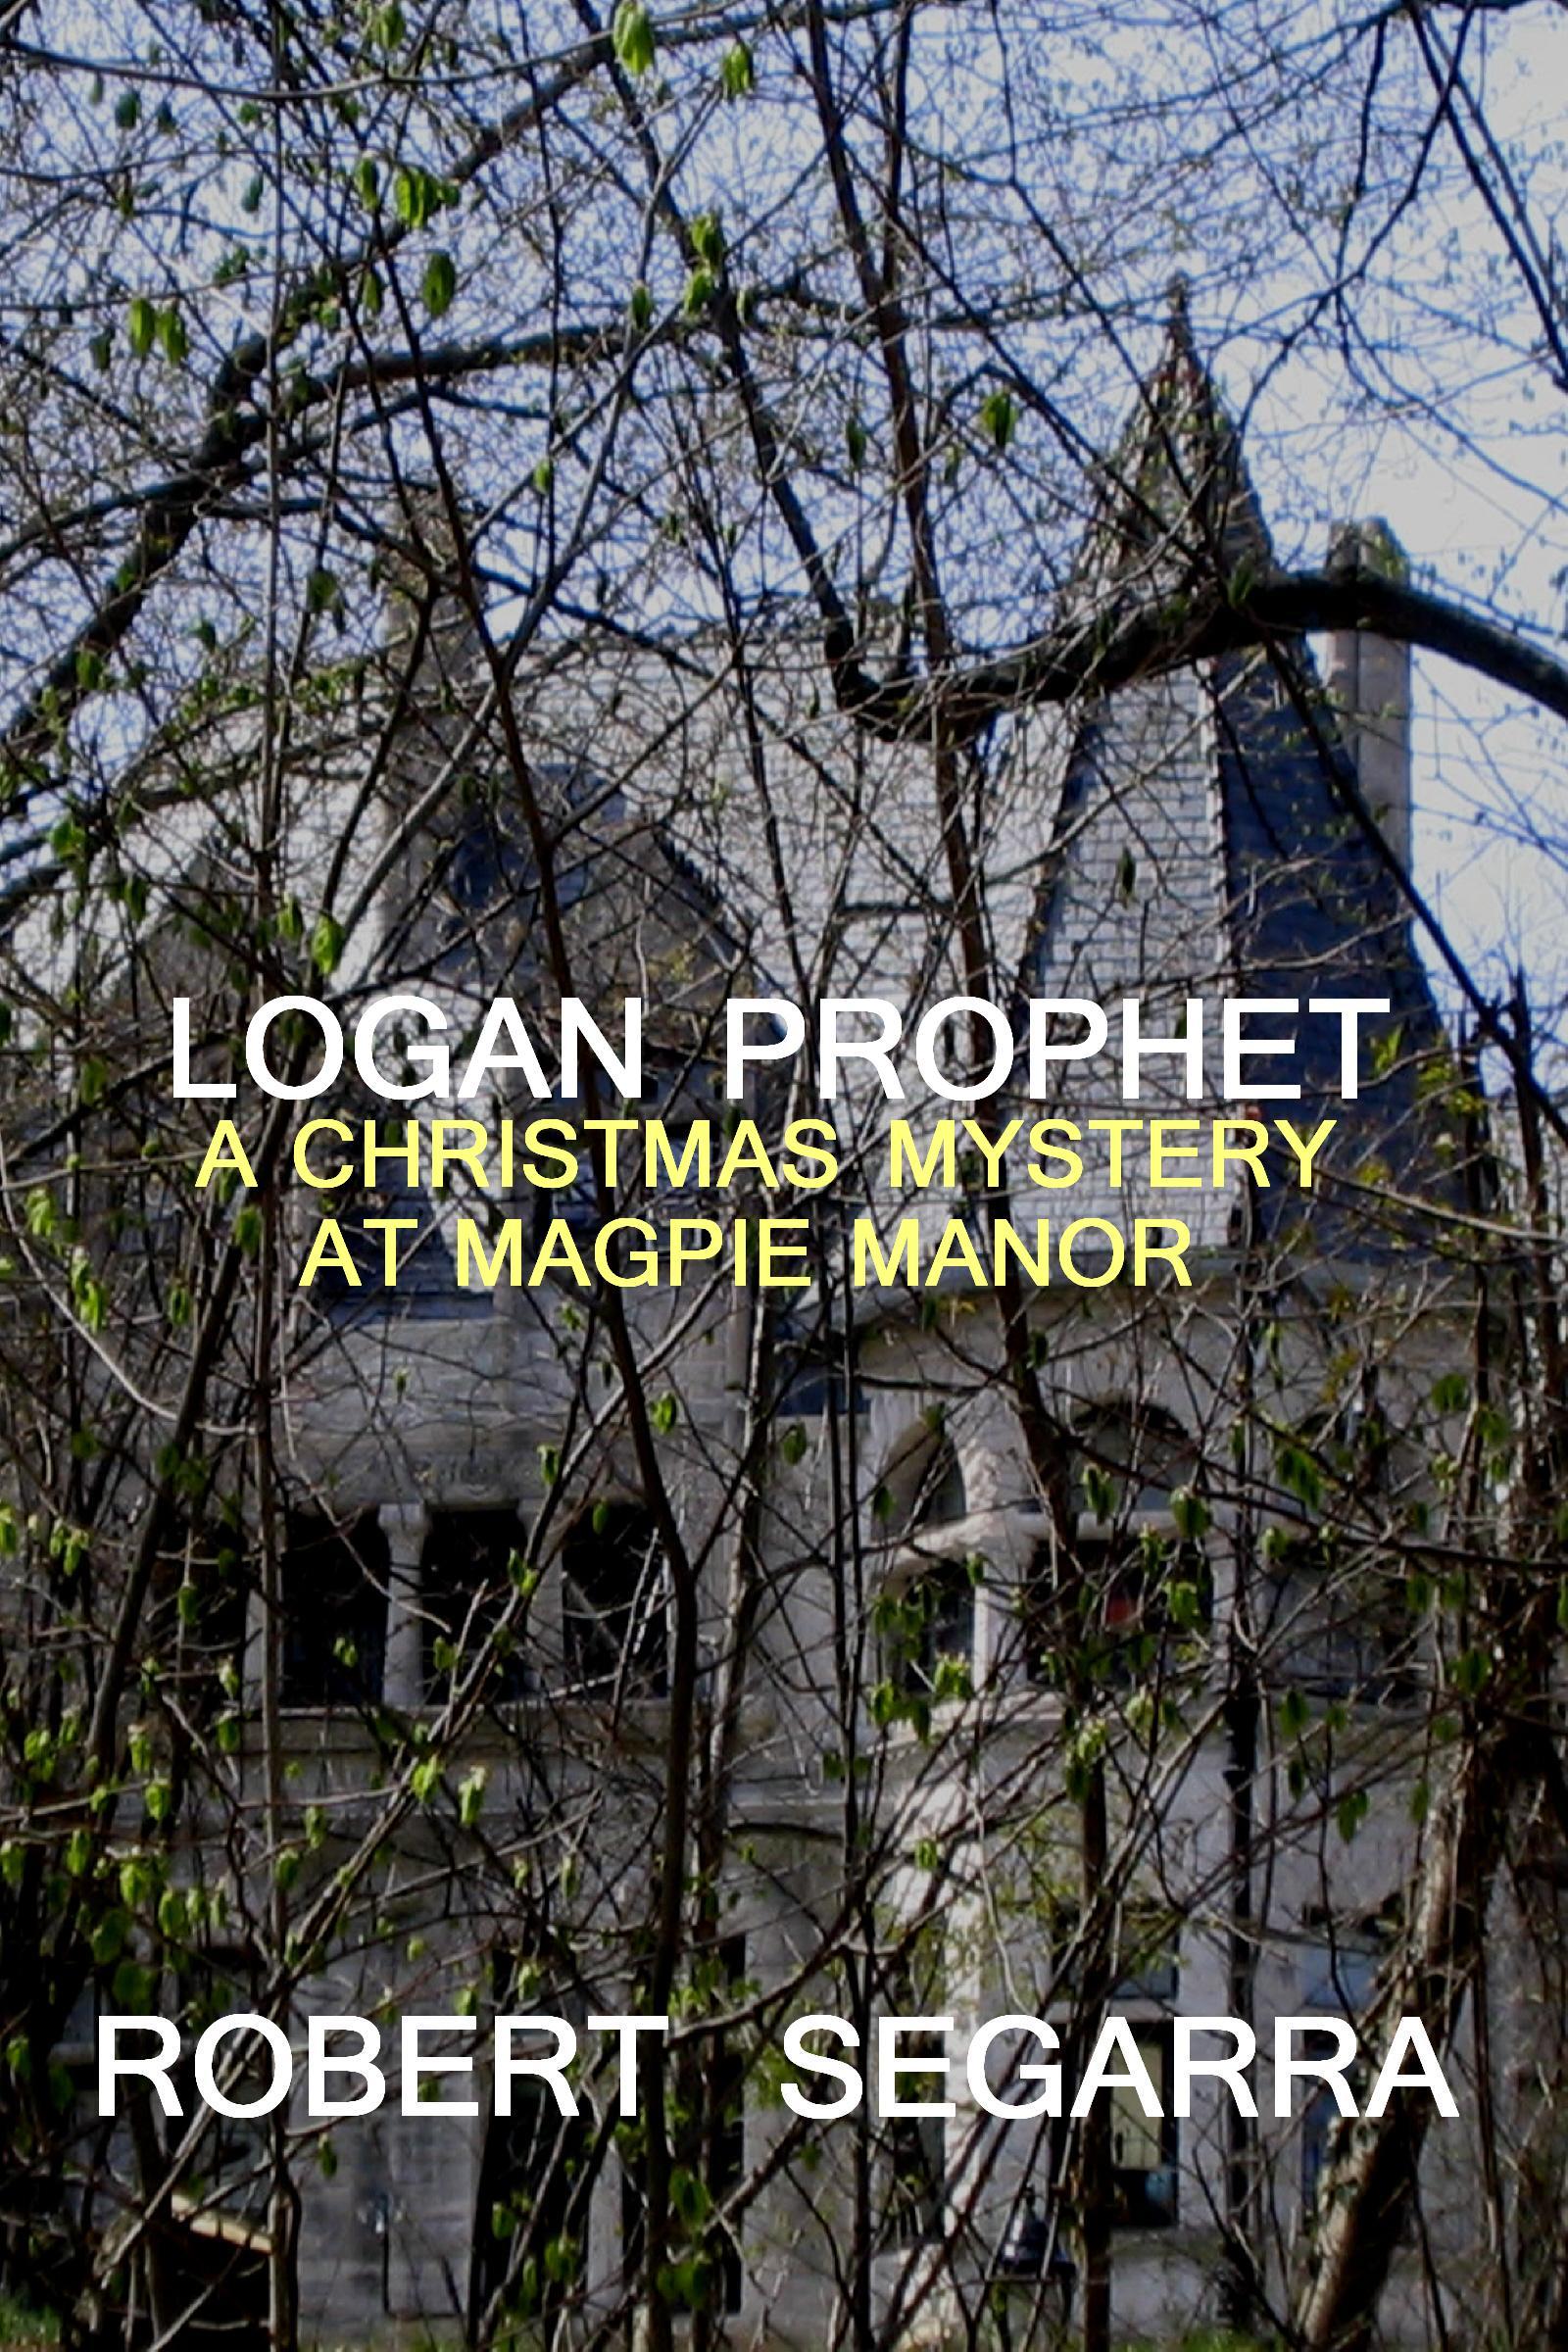 logan prophet a christmas mystery - A Christmas Mystery